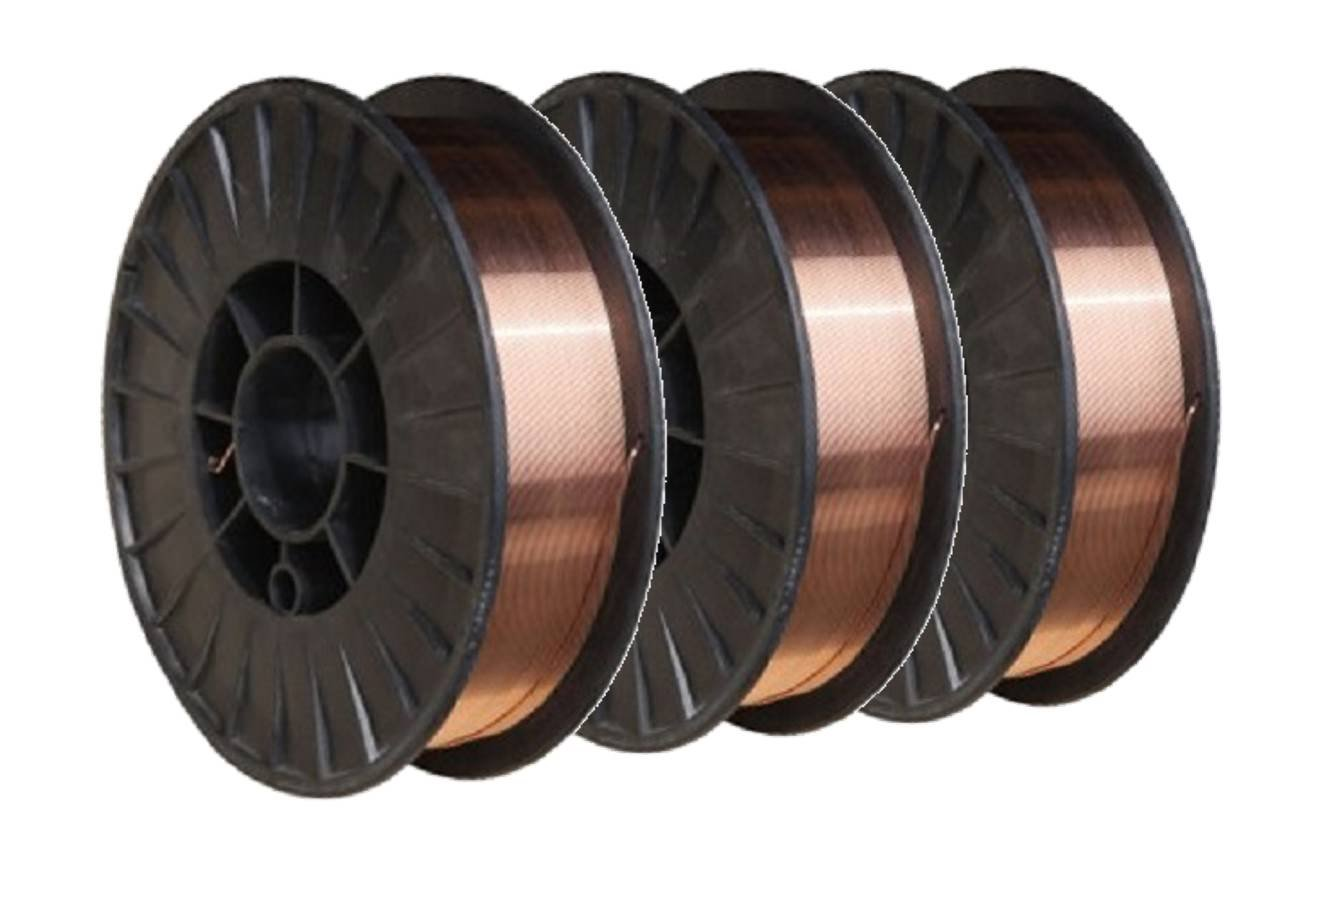 ER70S-6 - MIG Mild & Low Alloy Steel Wire - 11 Lb x 0.030'' - (3 SPOOLS) by TGB